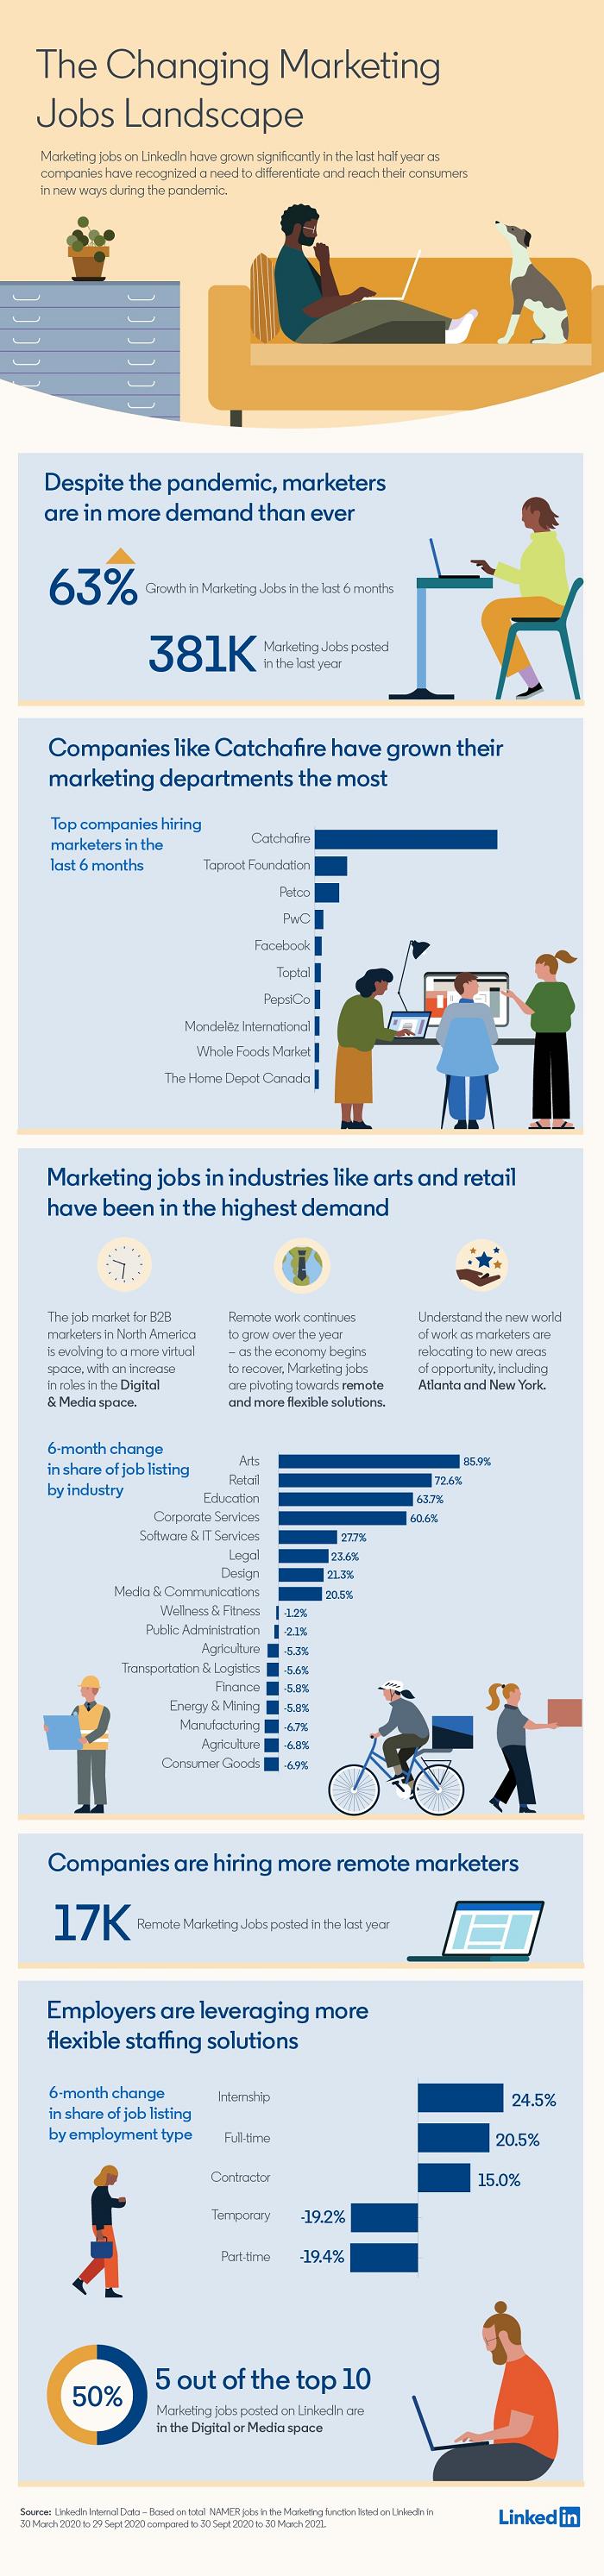 LinkedIn Marketing Landscape data overview